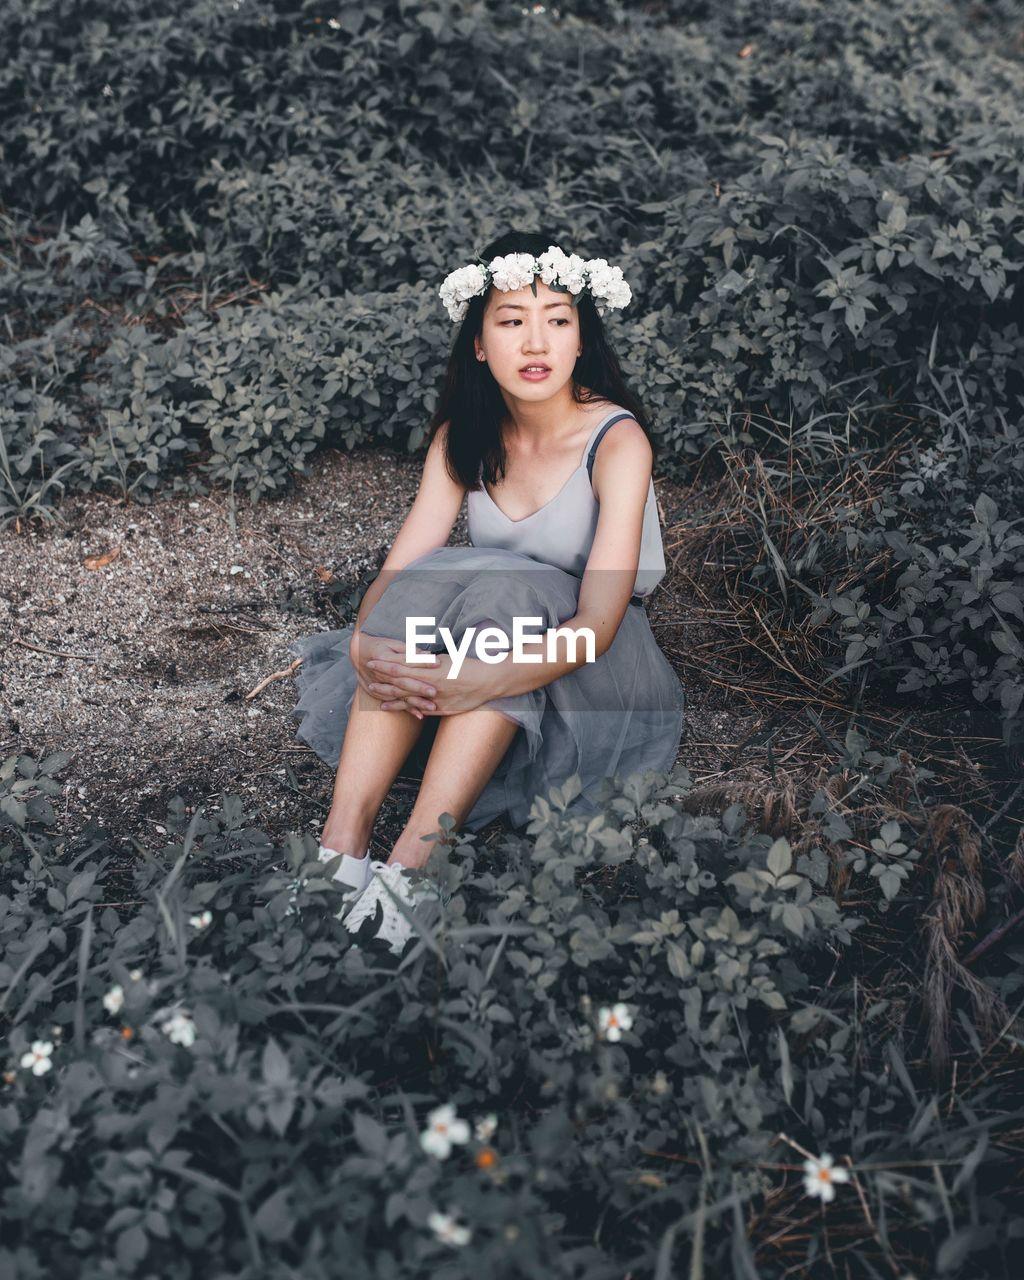 Thoughtful Woman Wearing Flowers Sitting On Field Amidst Plants